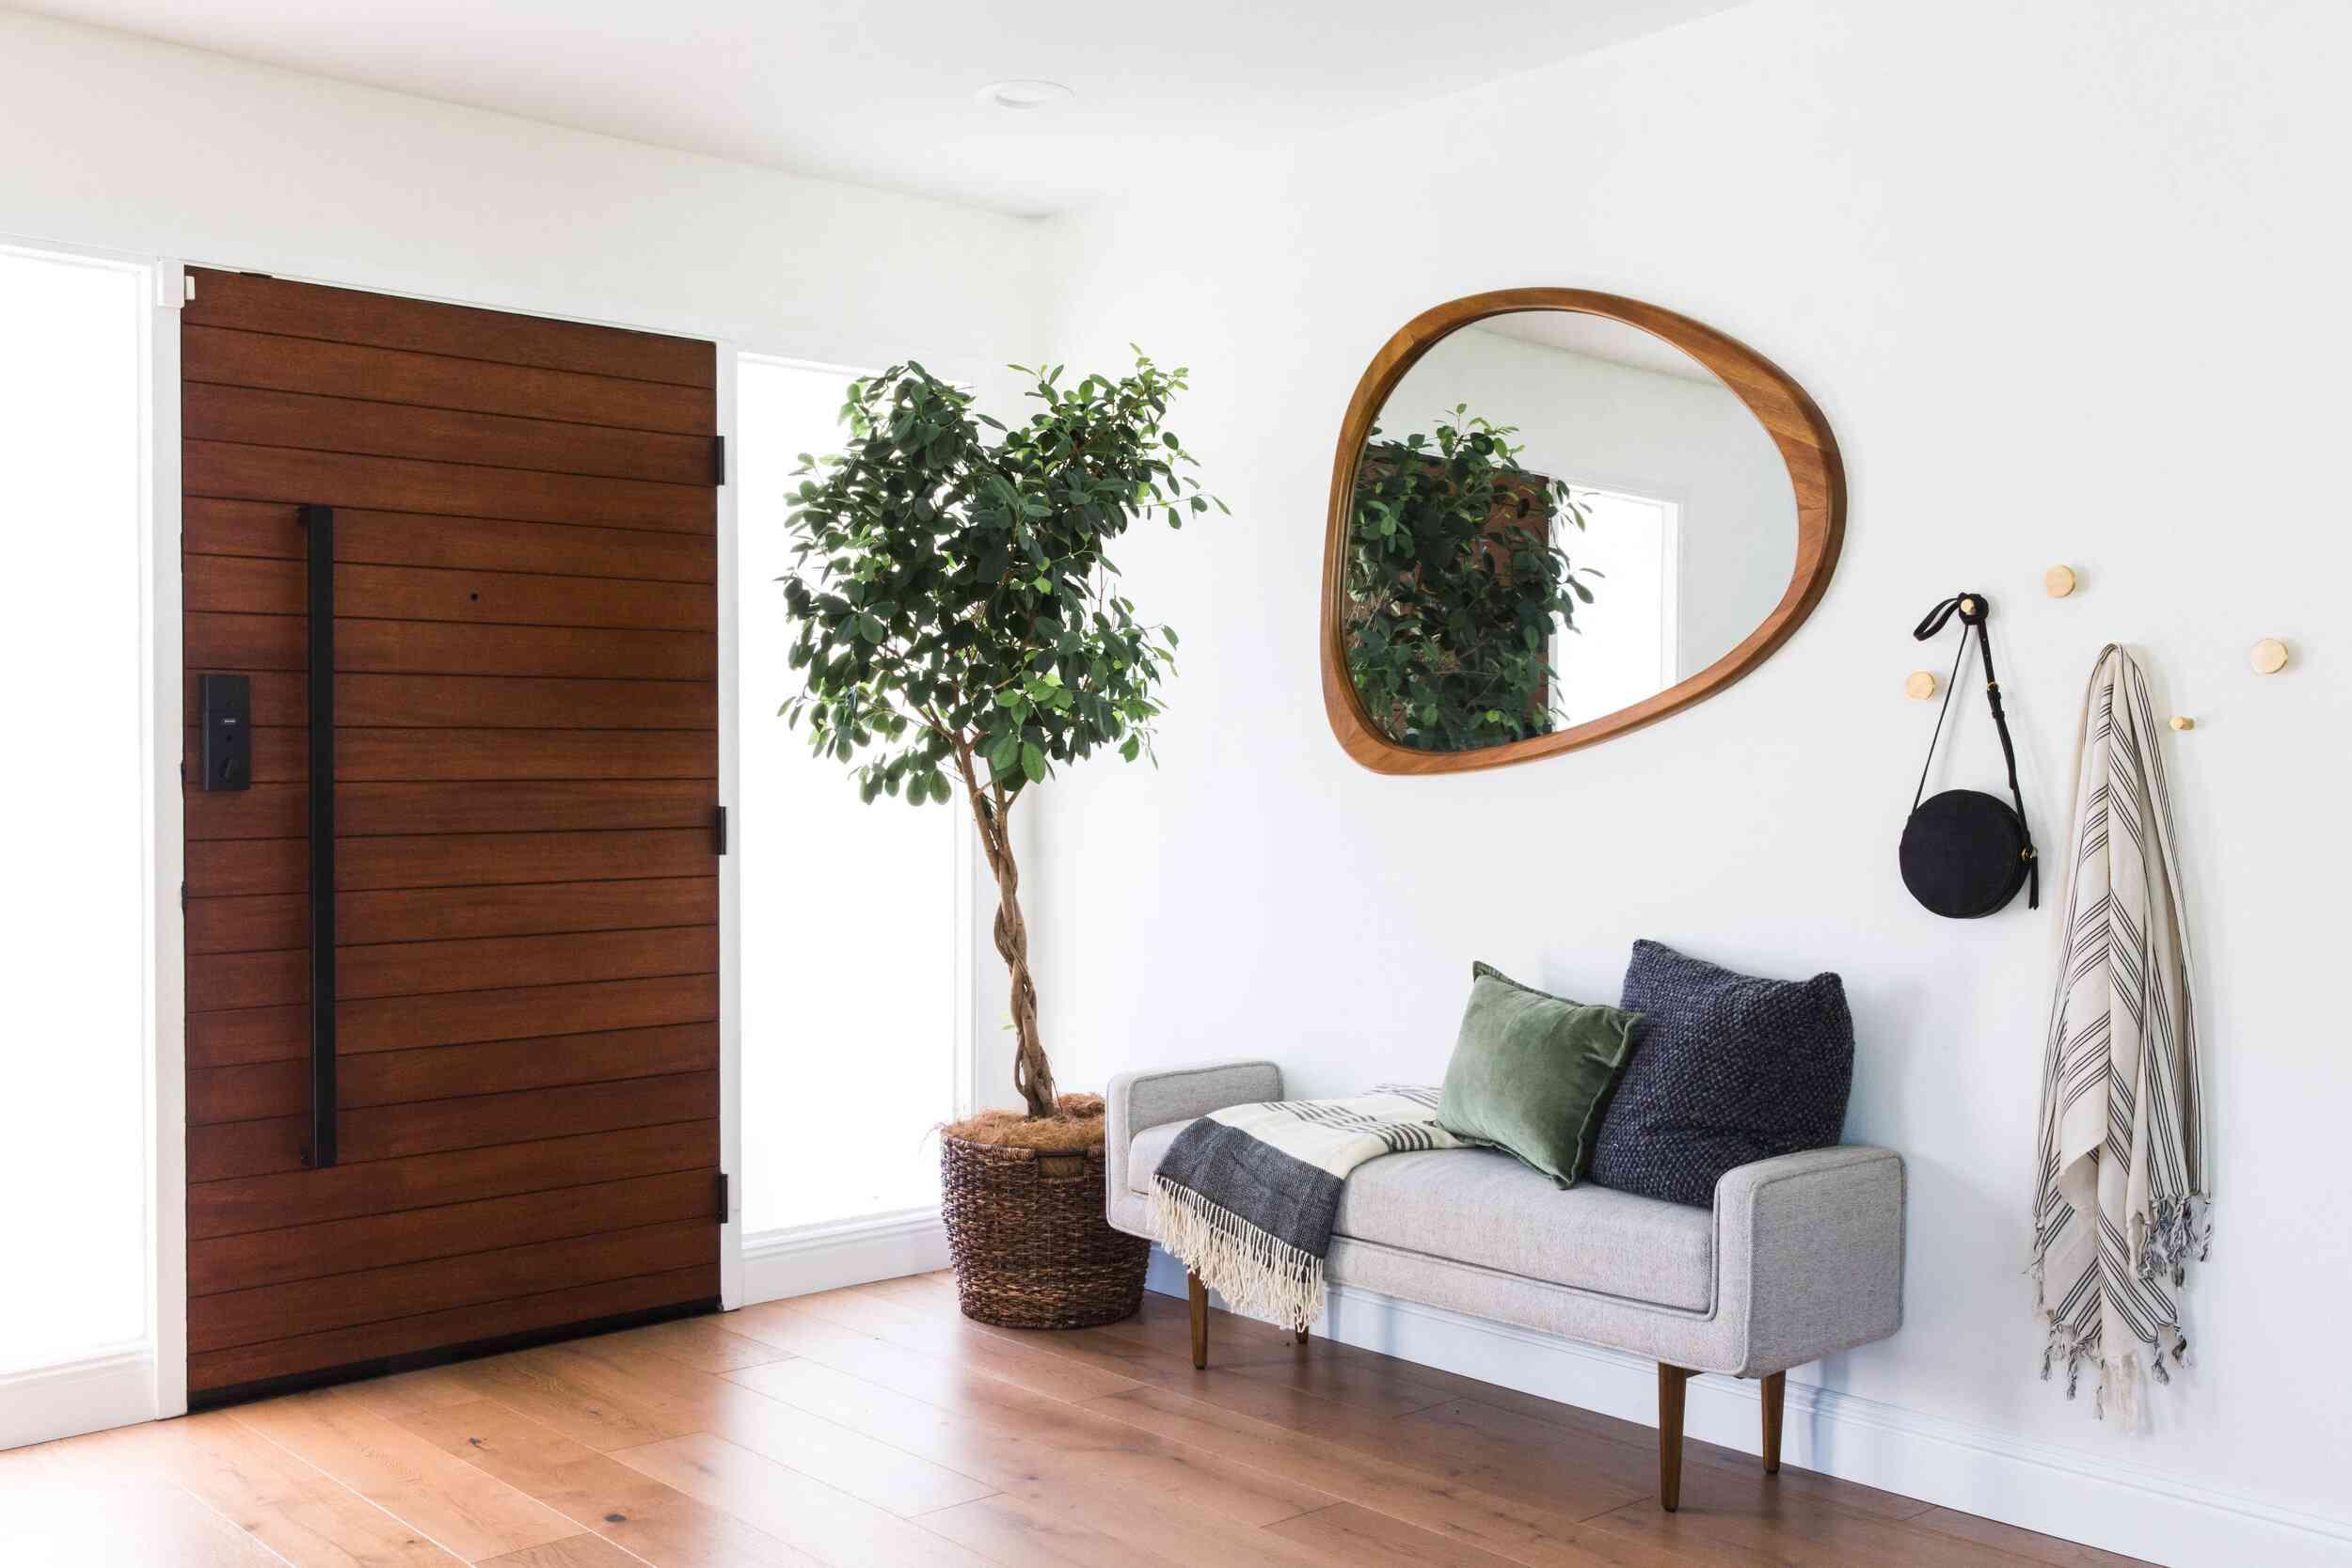 Weeping fig in a modern entryway